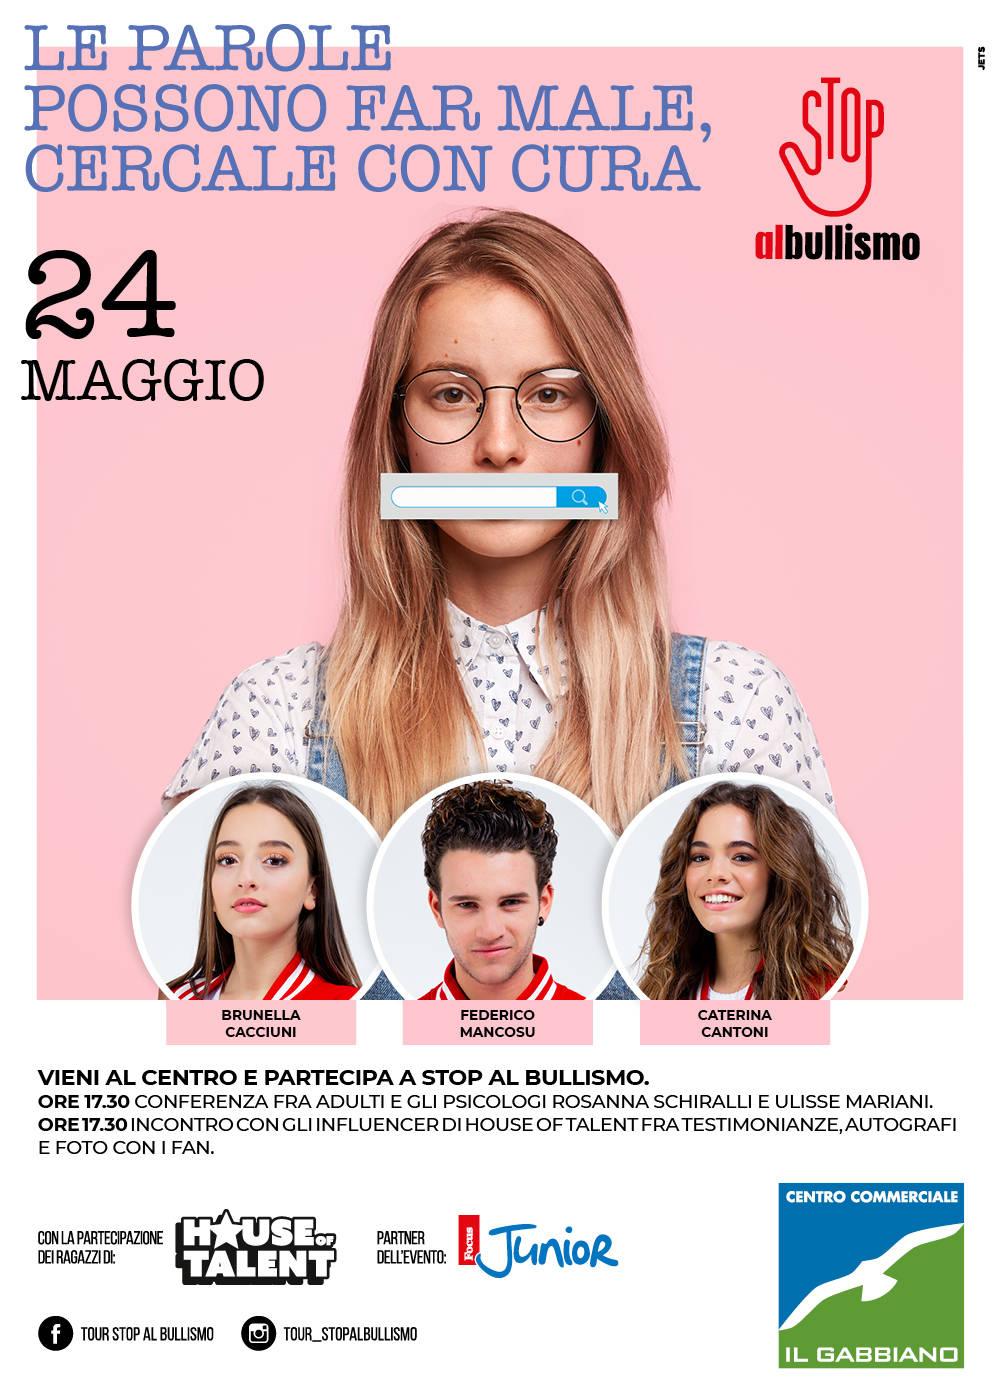 Stop Bullismo Savona